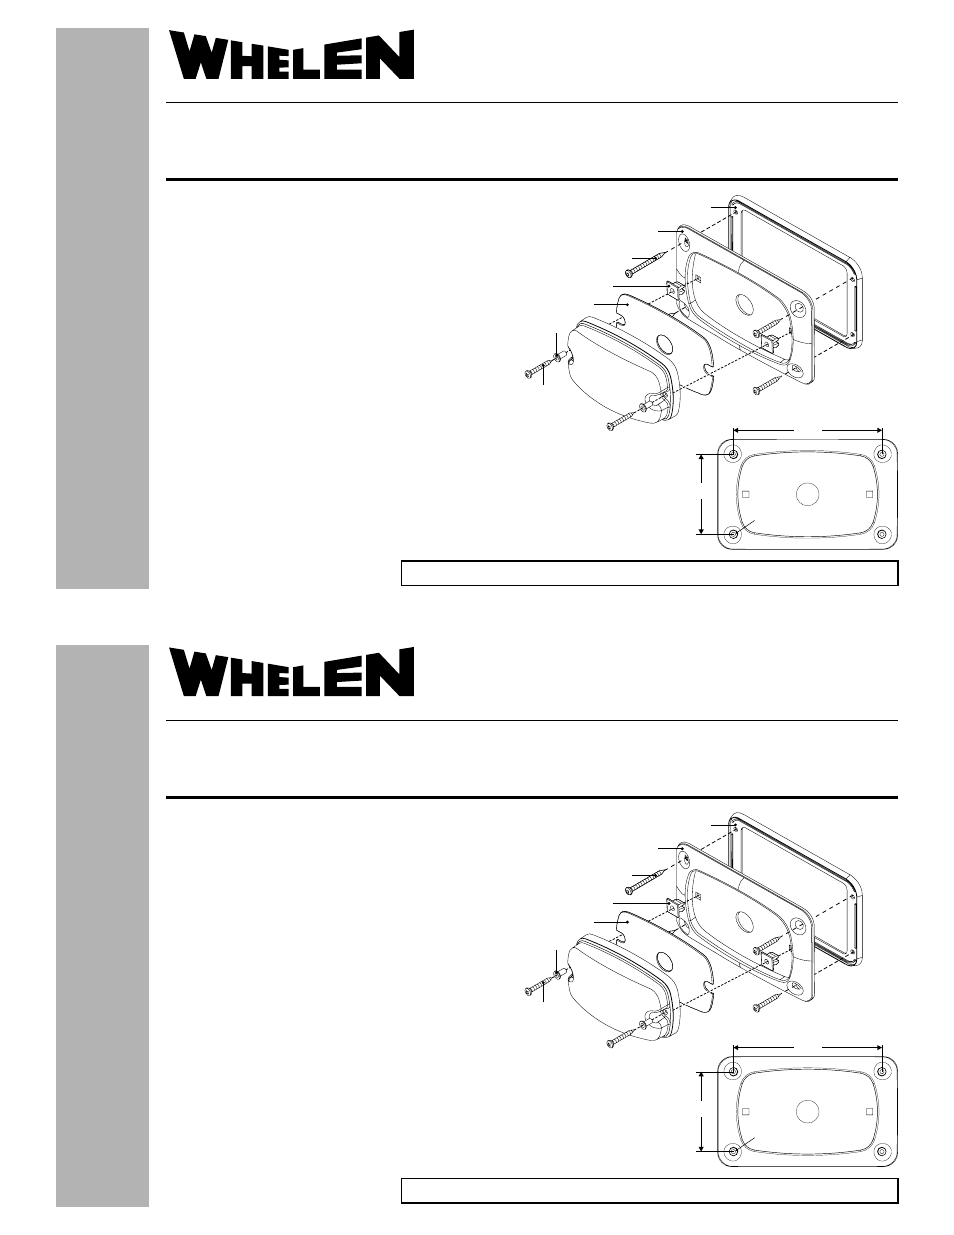 hight resolution of  whelen m6fc600 user manual 1 page on whelen lights whelen lightbar diagram